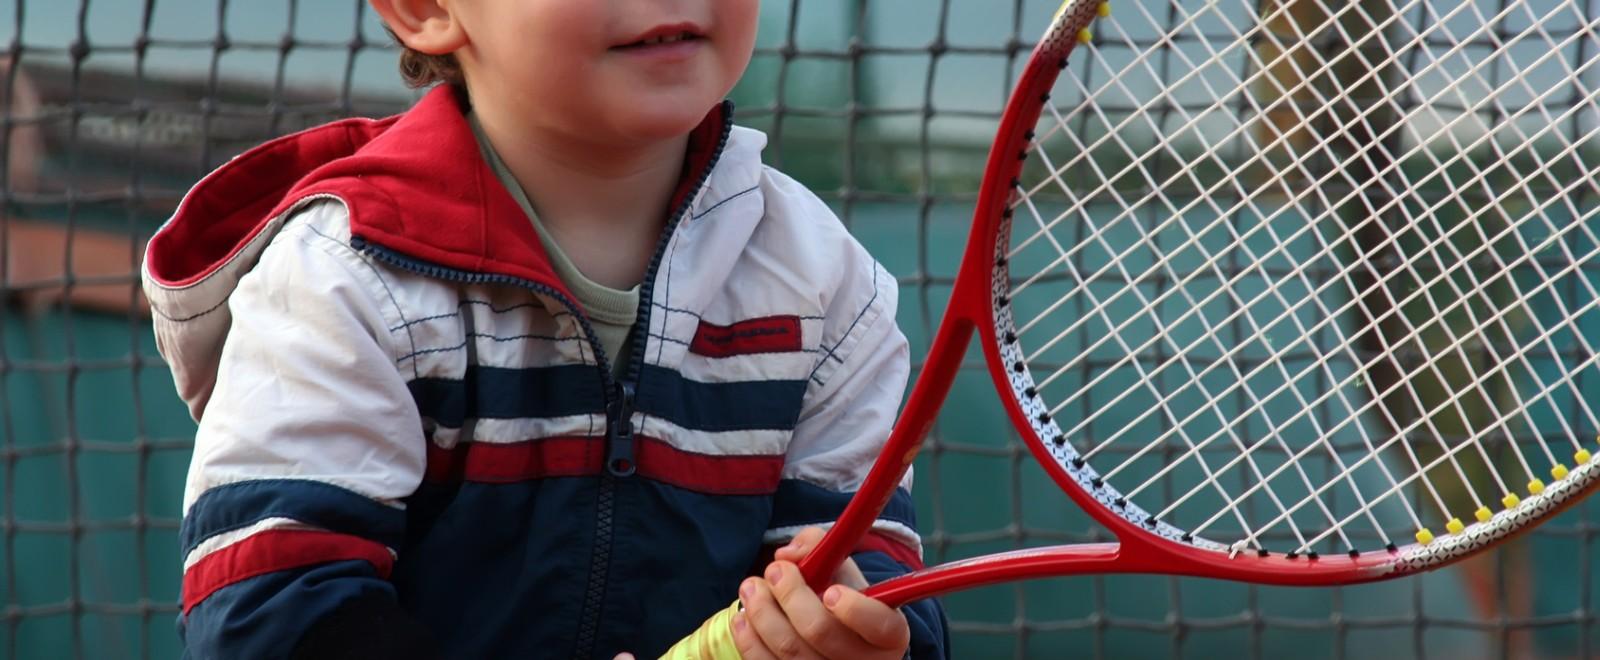 tennis_f_6023034